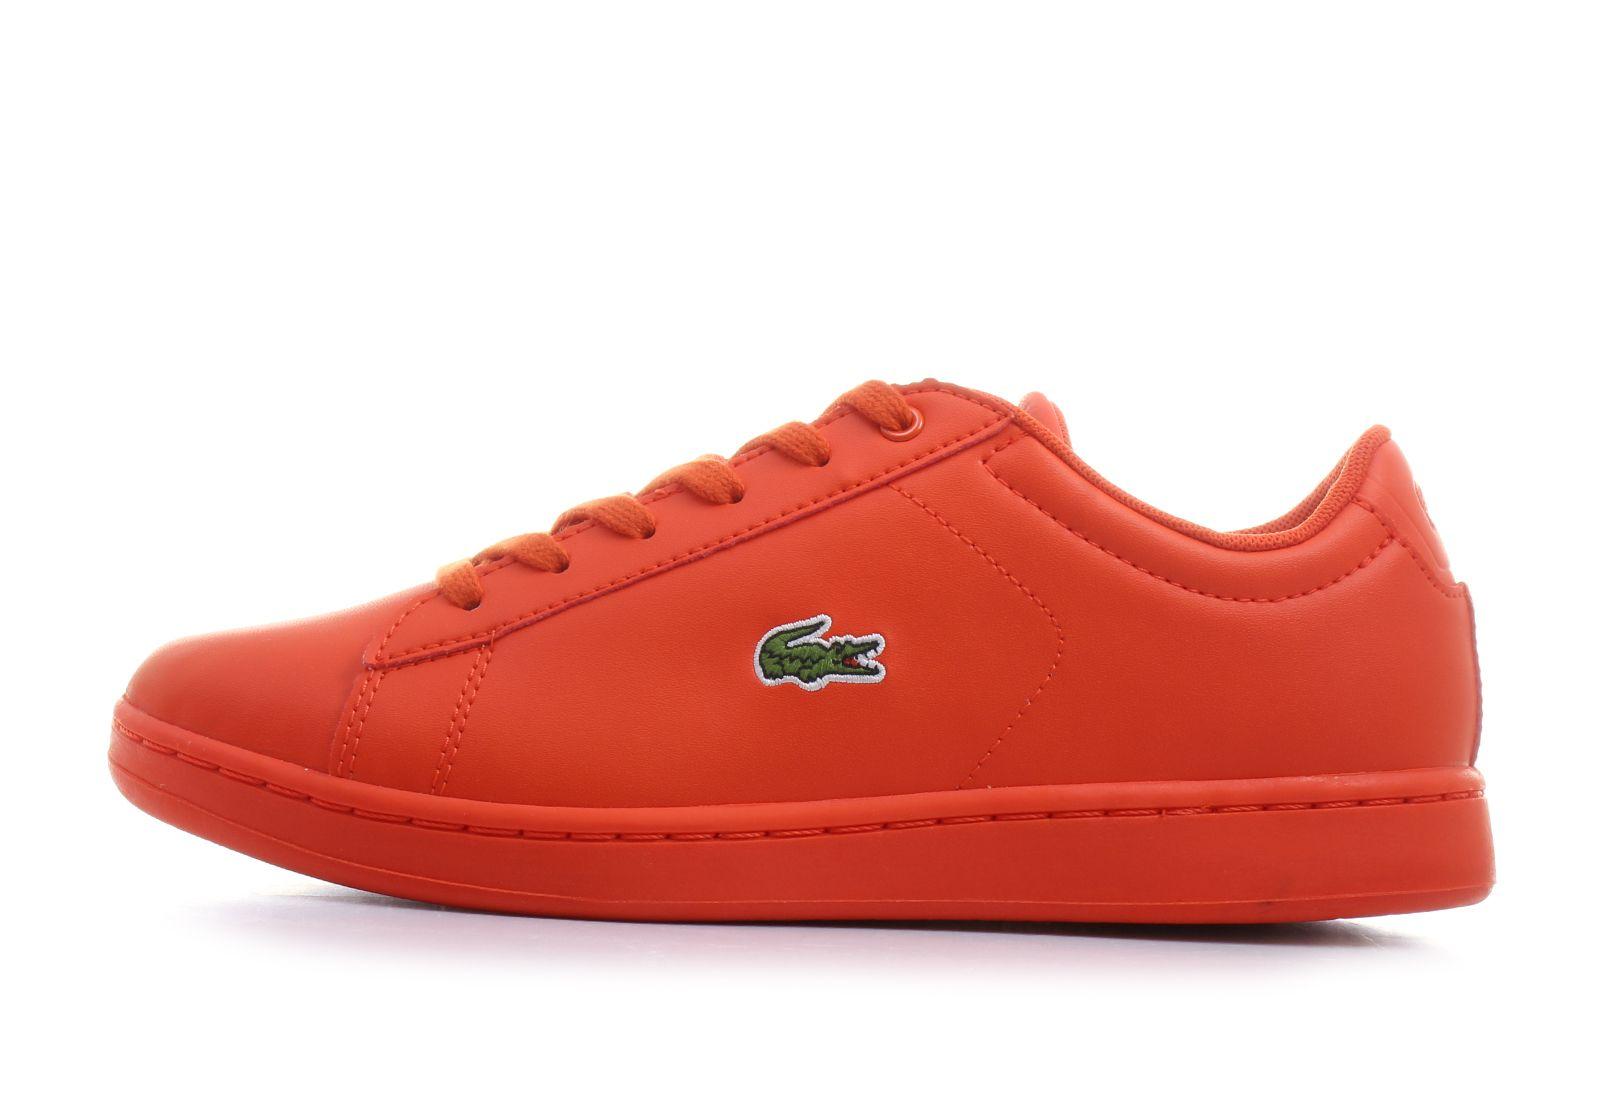 cb74e848b6 Lacoste Cipő - Carnaby Evo - 173SPJ0005-047 - Office Shoes Magyarország